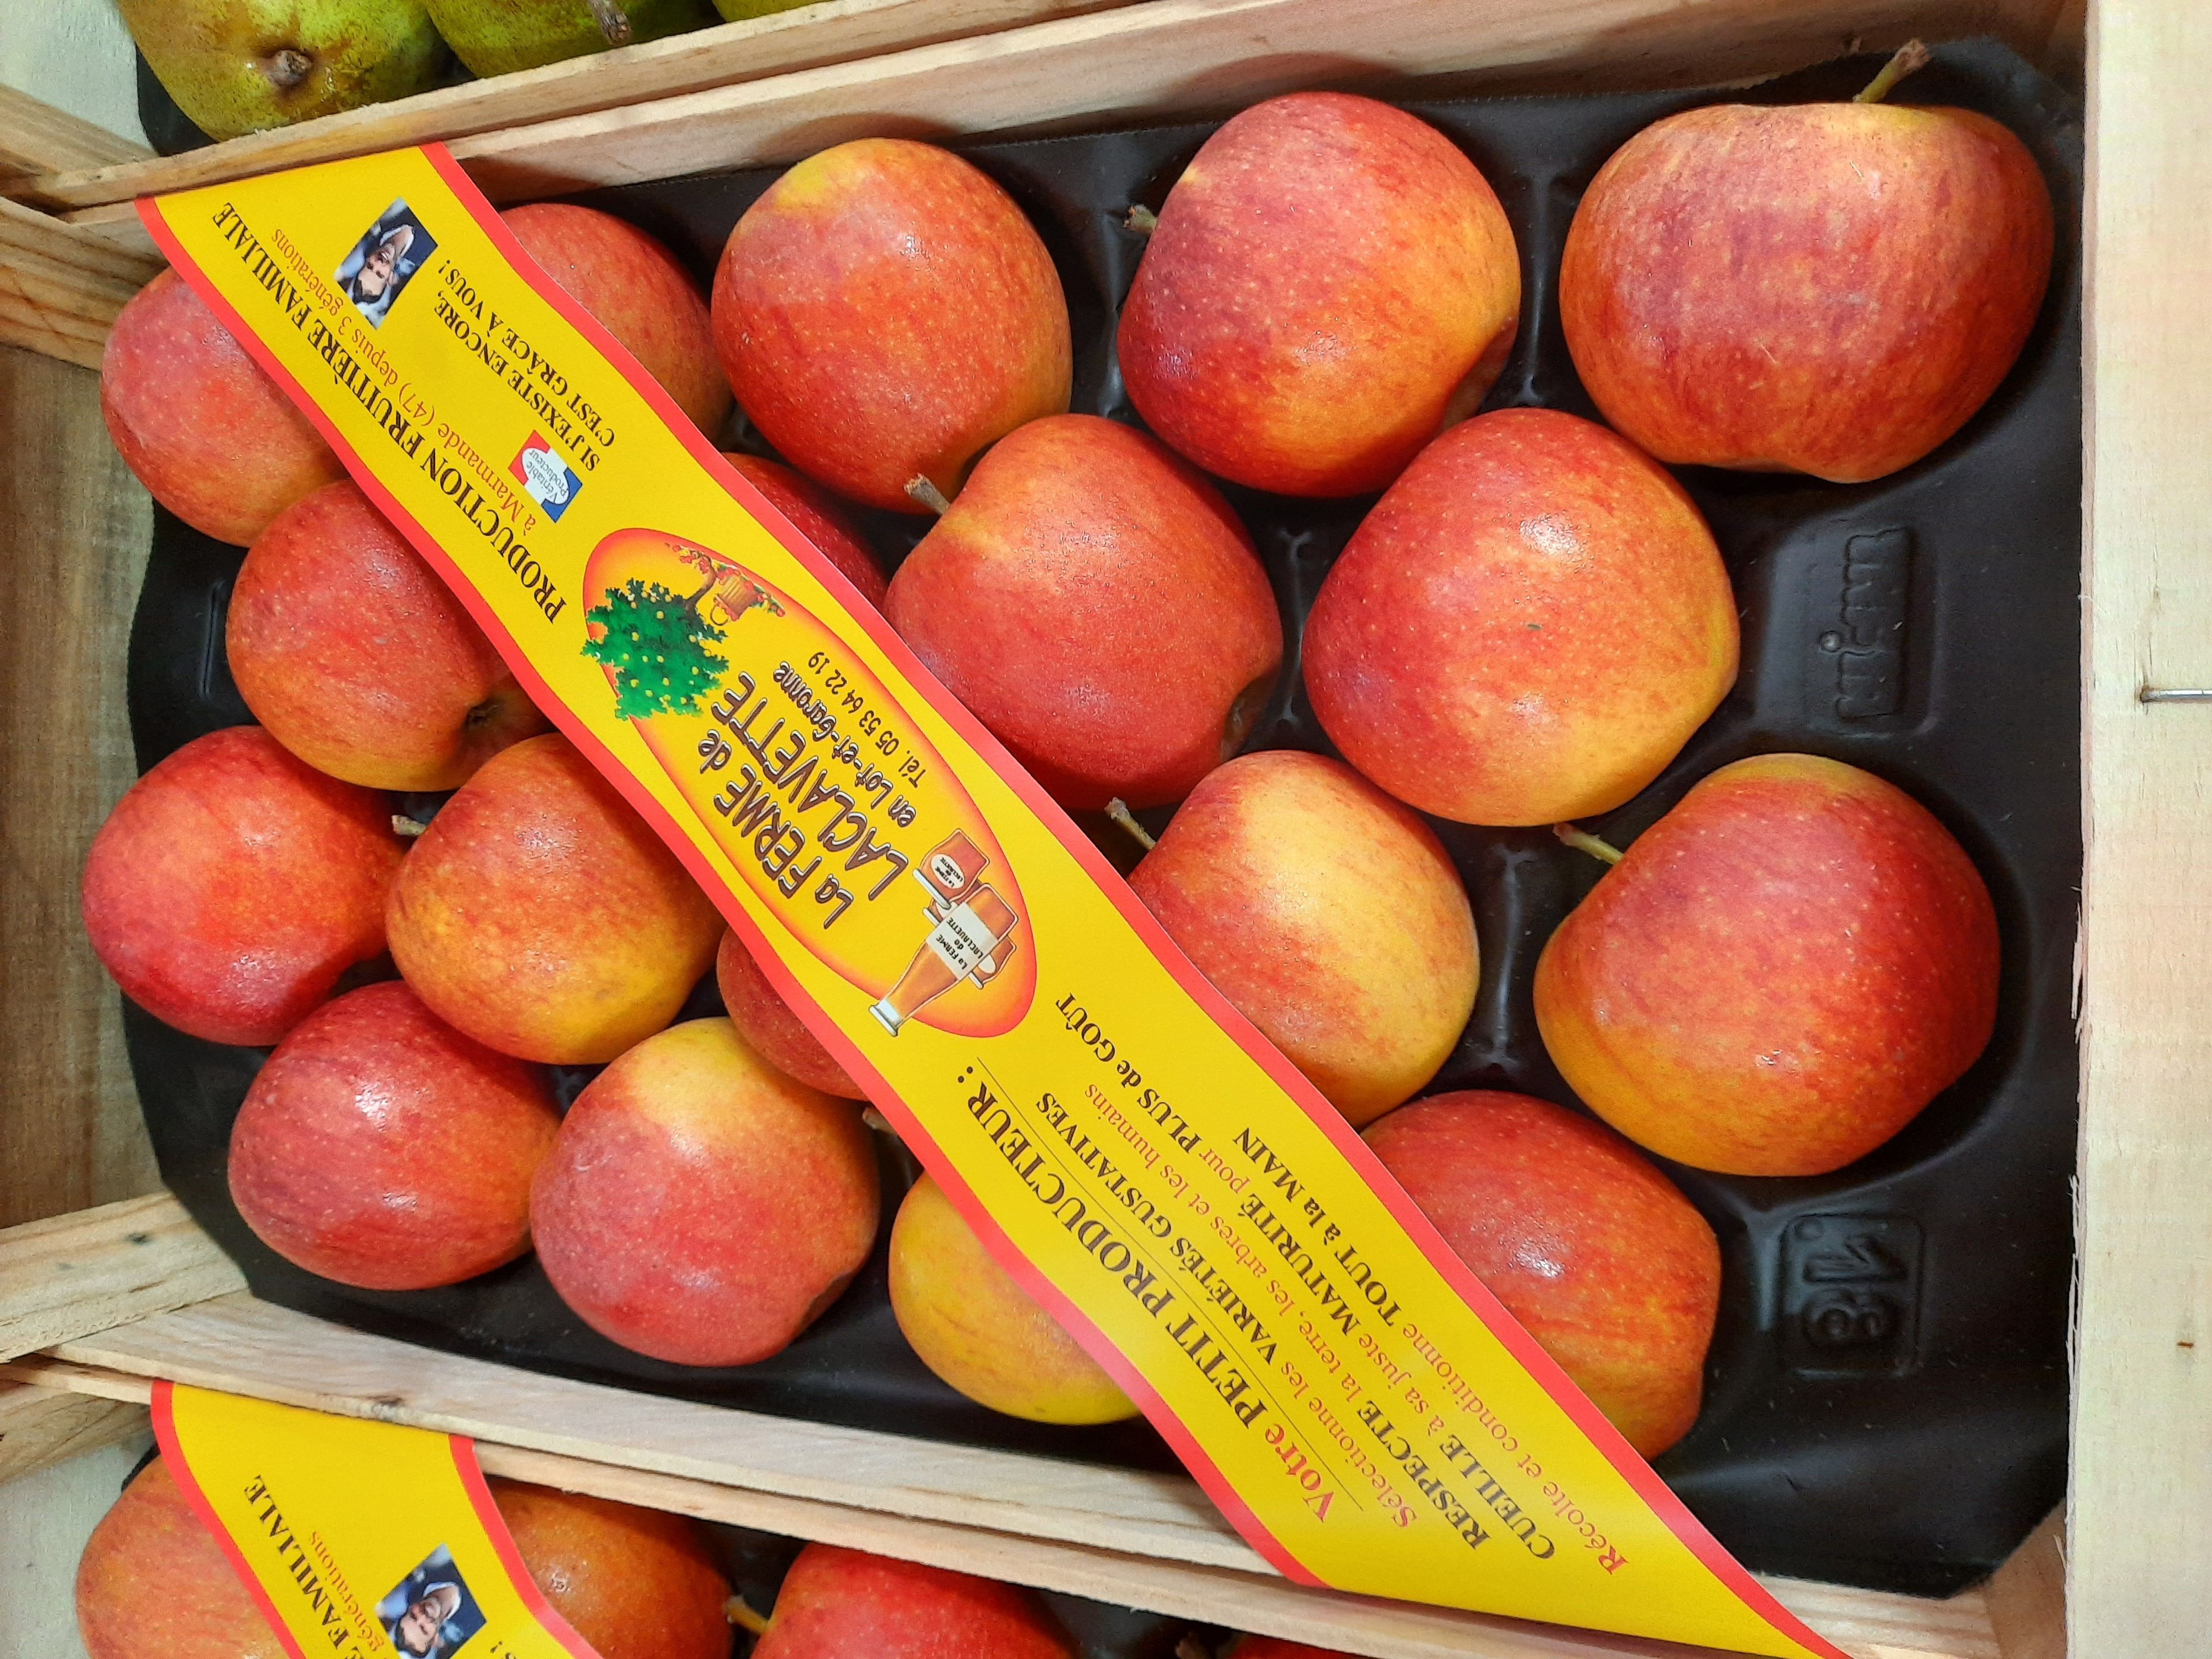 Pommes - plateau - fruits - bande - lafermedelaclavette